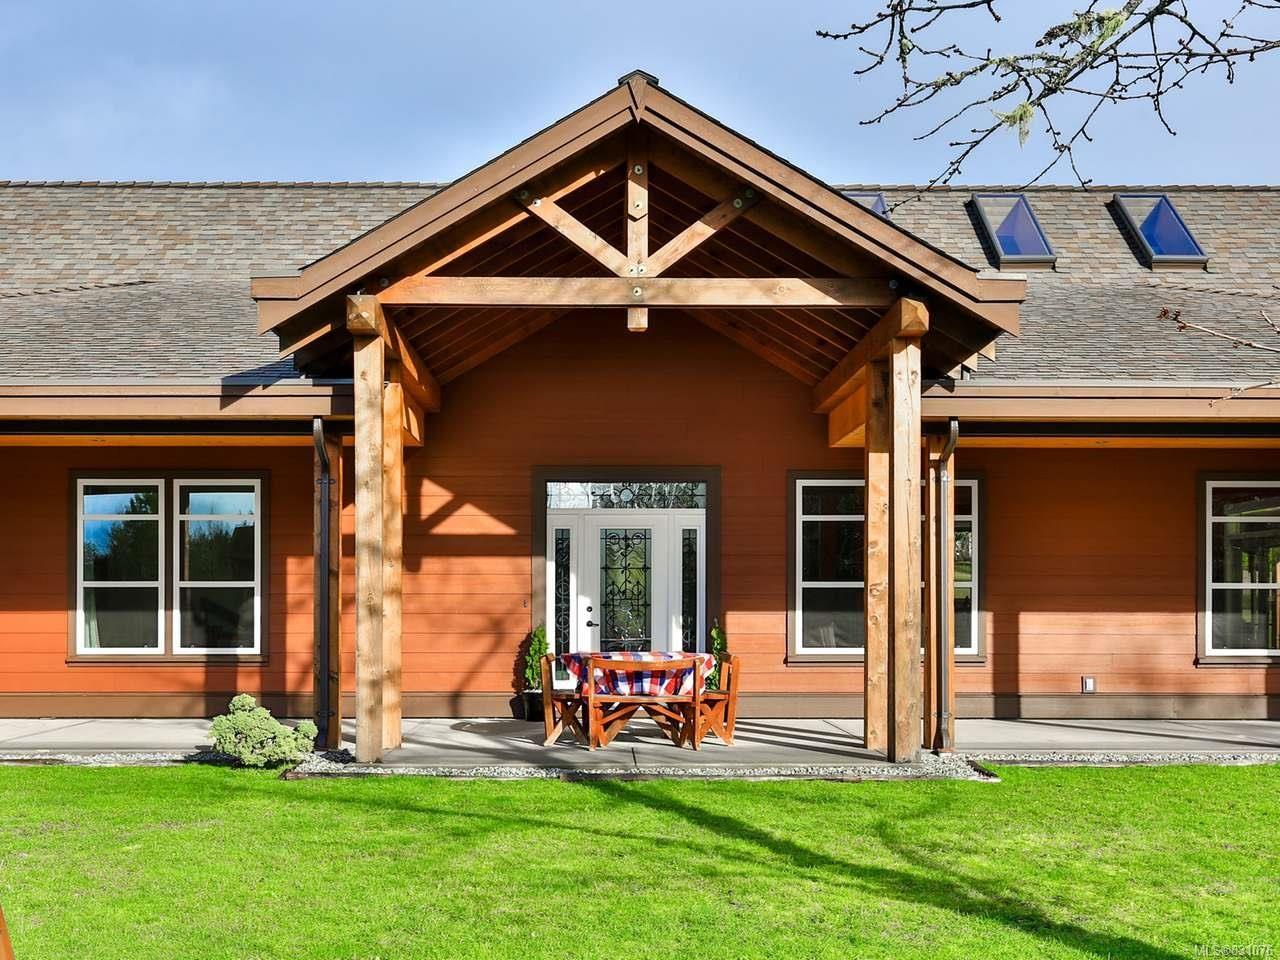 Photo 29: Photos: 6159 Strathcona St in PORT ALBERNI: PA Alberni Valley House for sale (Port Alberni)  : MLS®# 831076